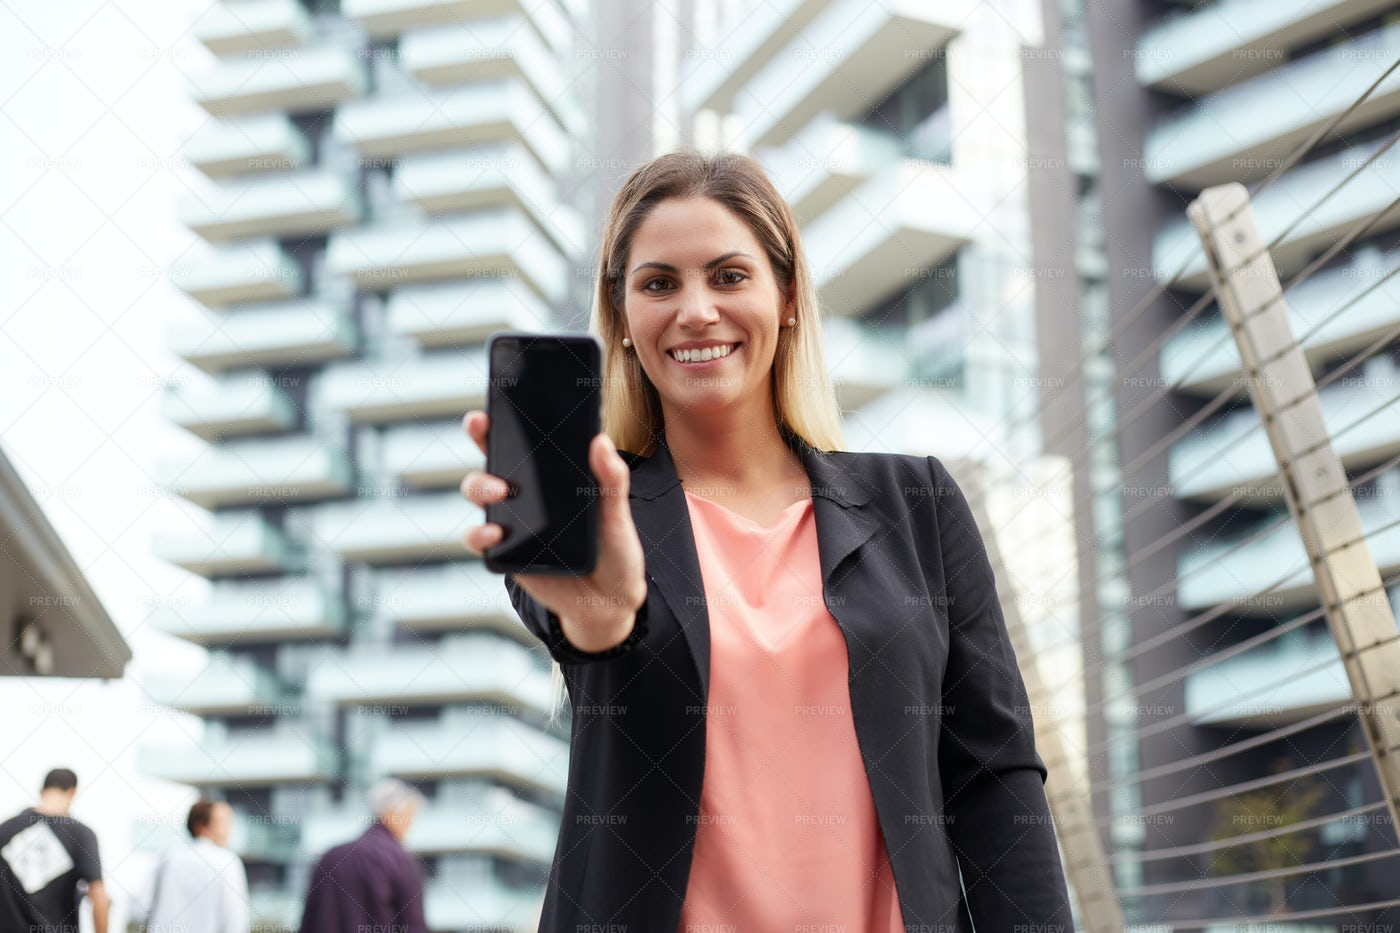 Businesswoman Showing Smartphone: Stock Photos